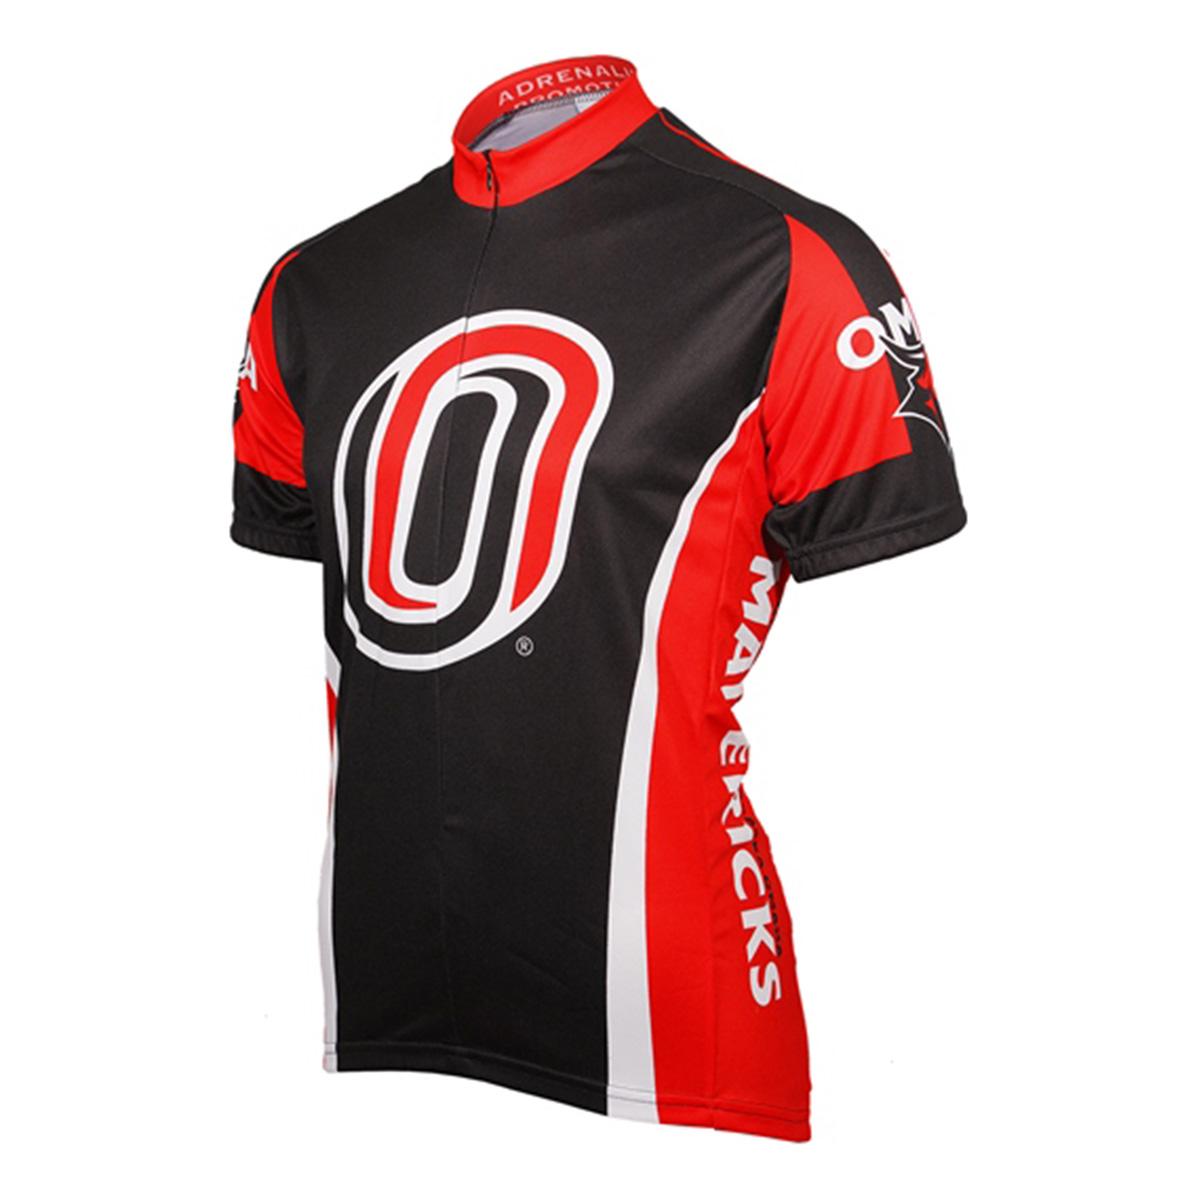 Adrenaline Promotions University of Nebraska Omaha Uno Cycling Jersey